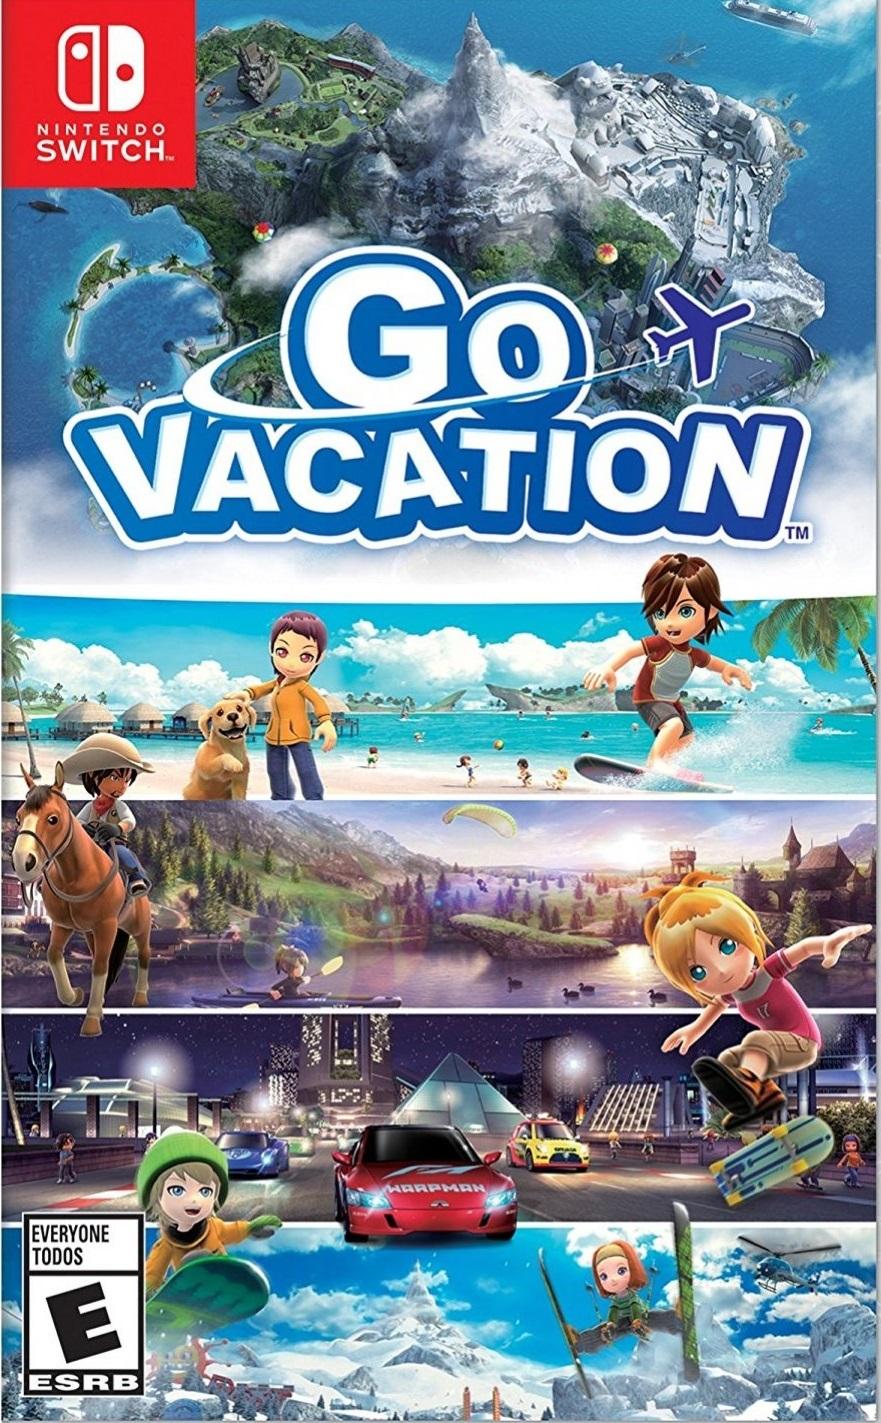 go-vacation-562943.1.jpg